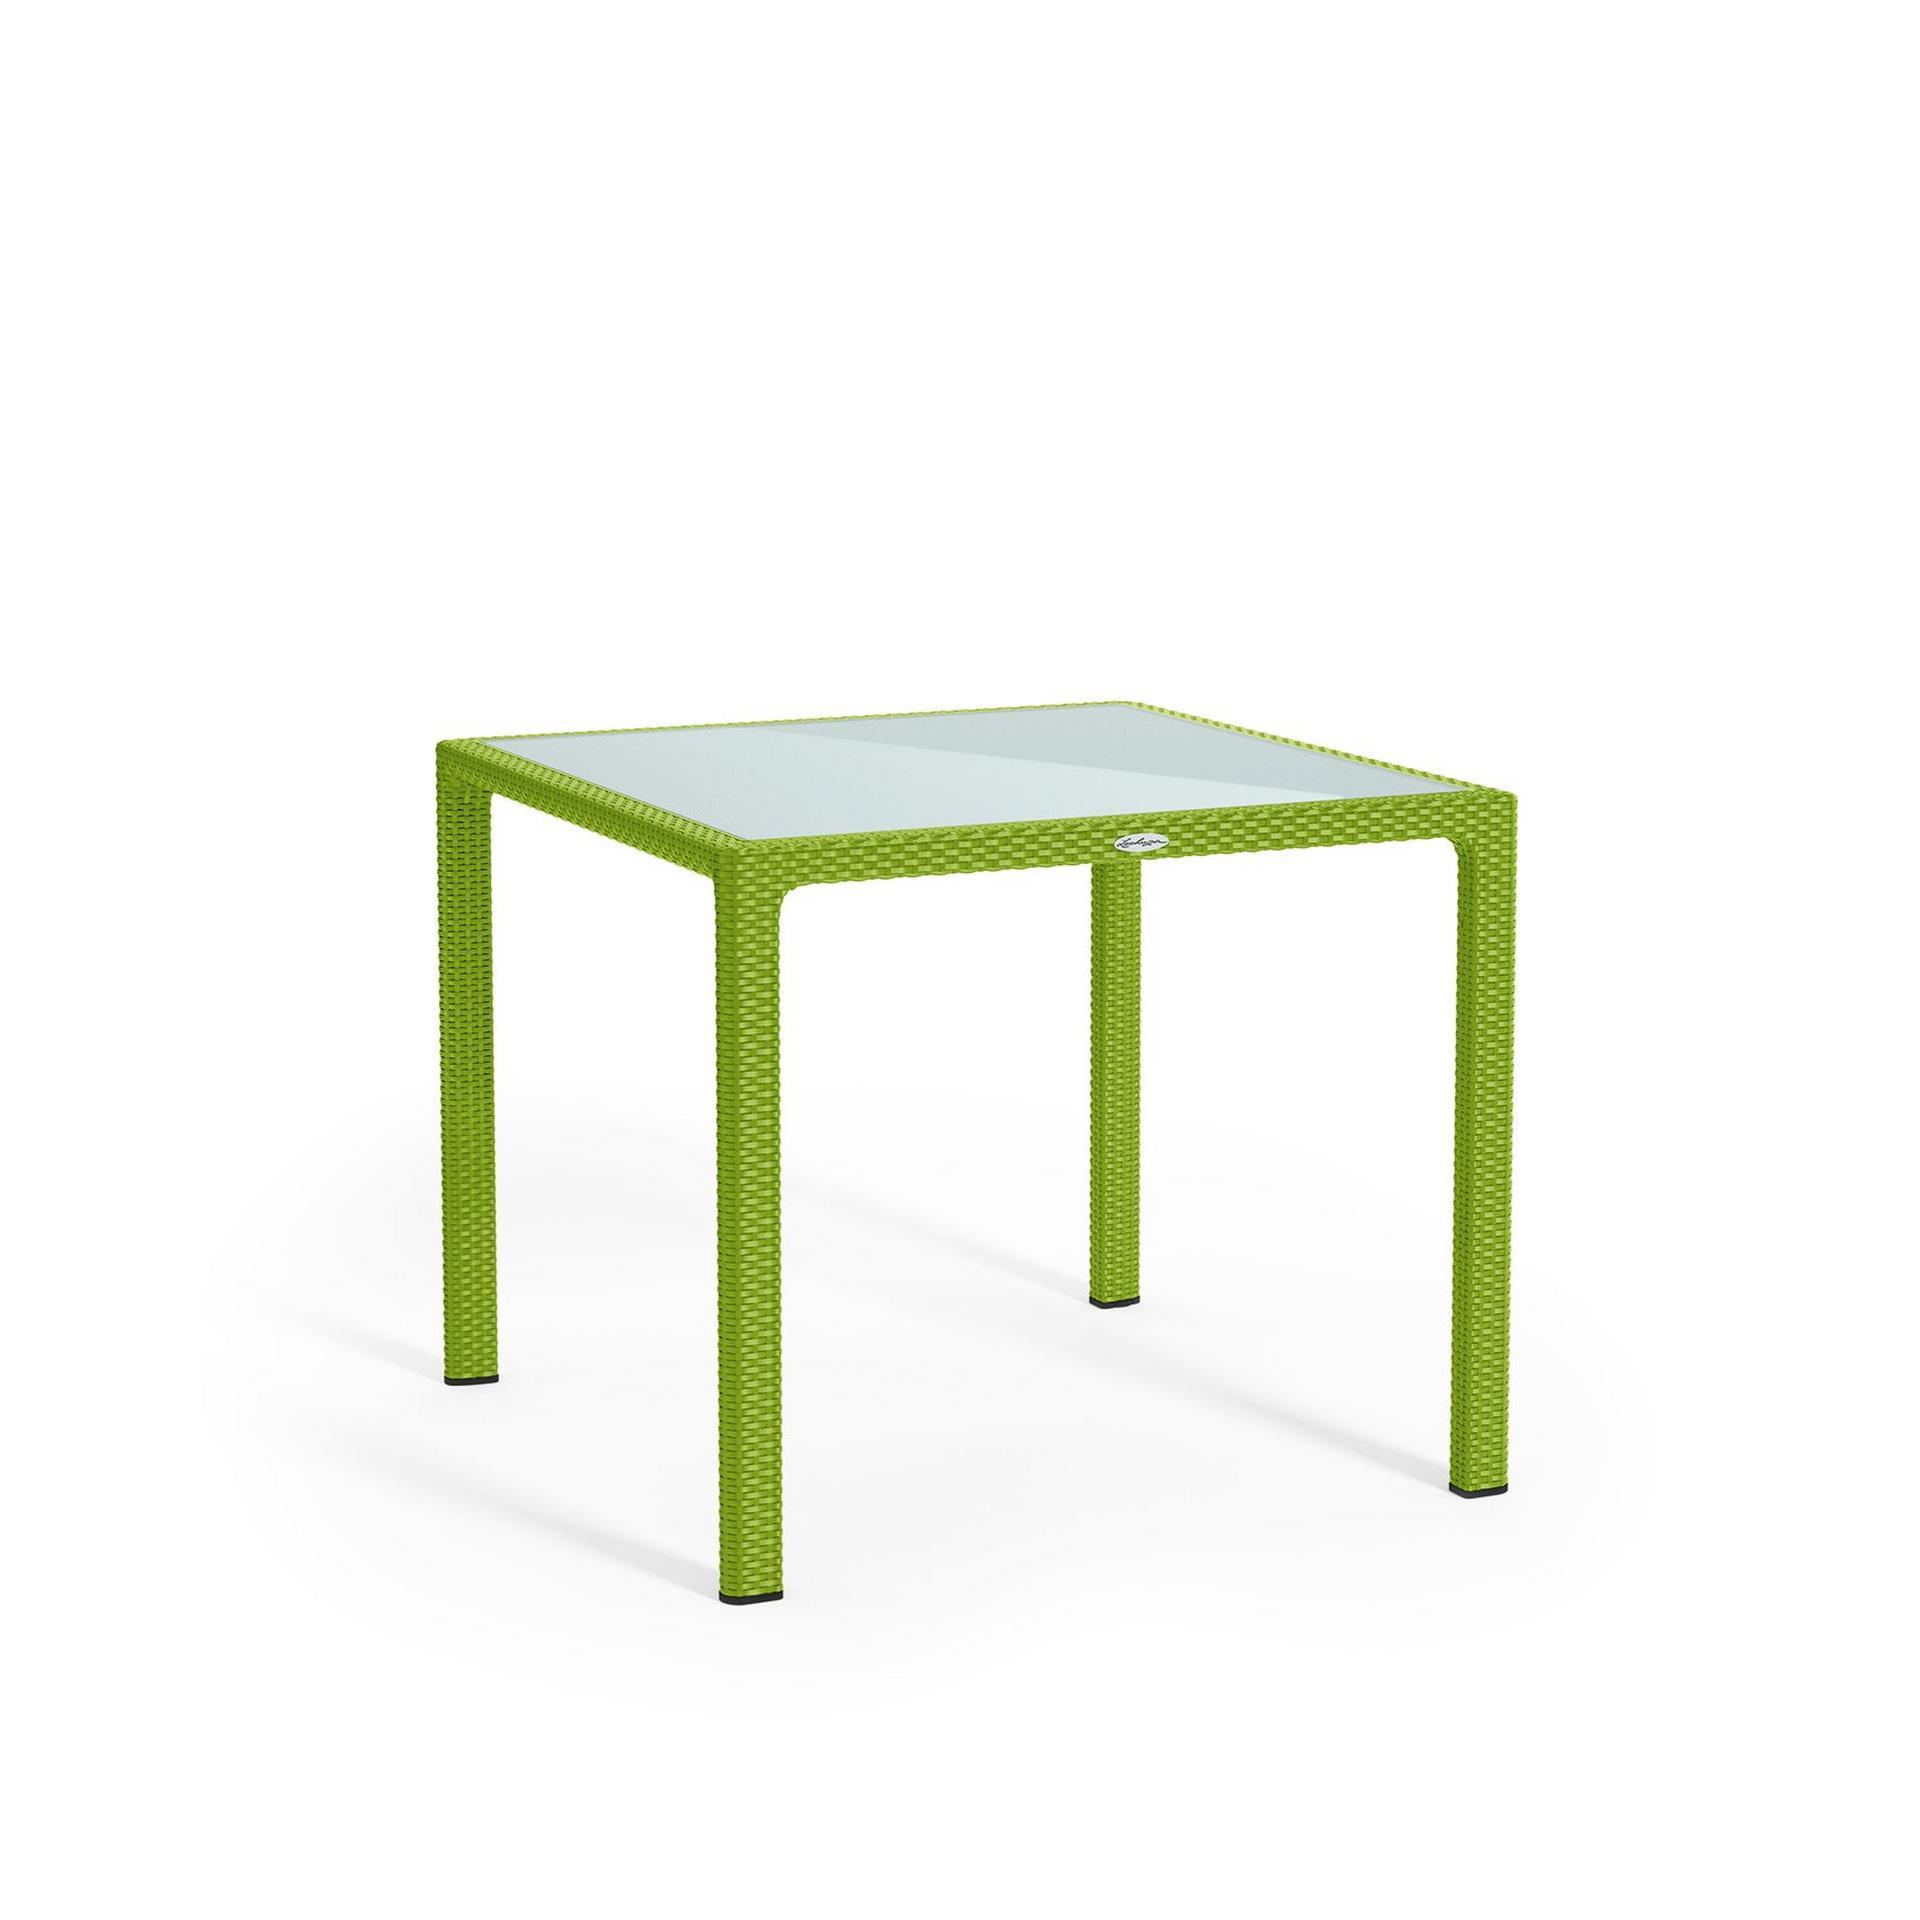 Petite table vert pomme